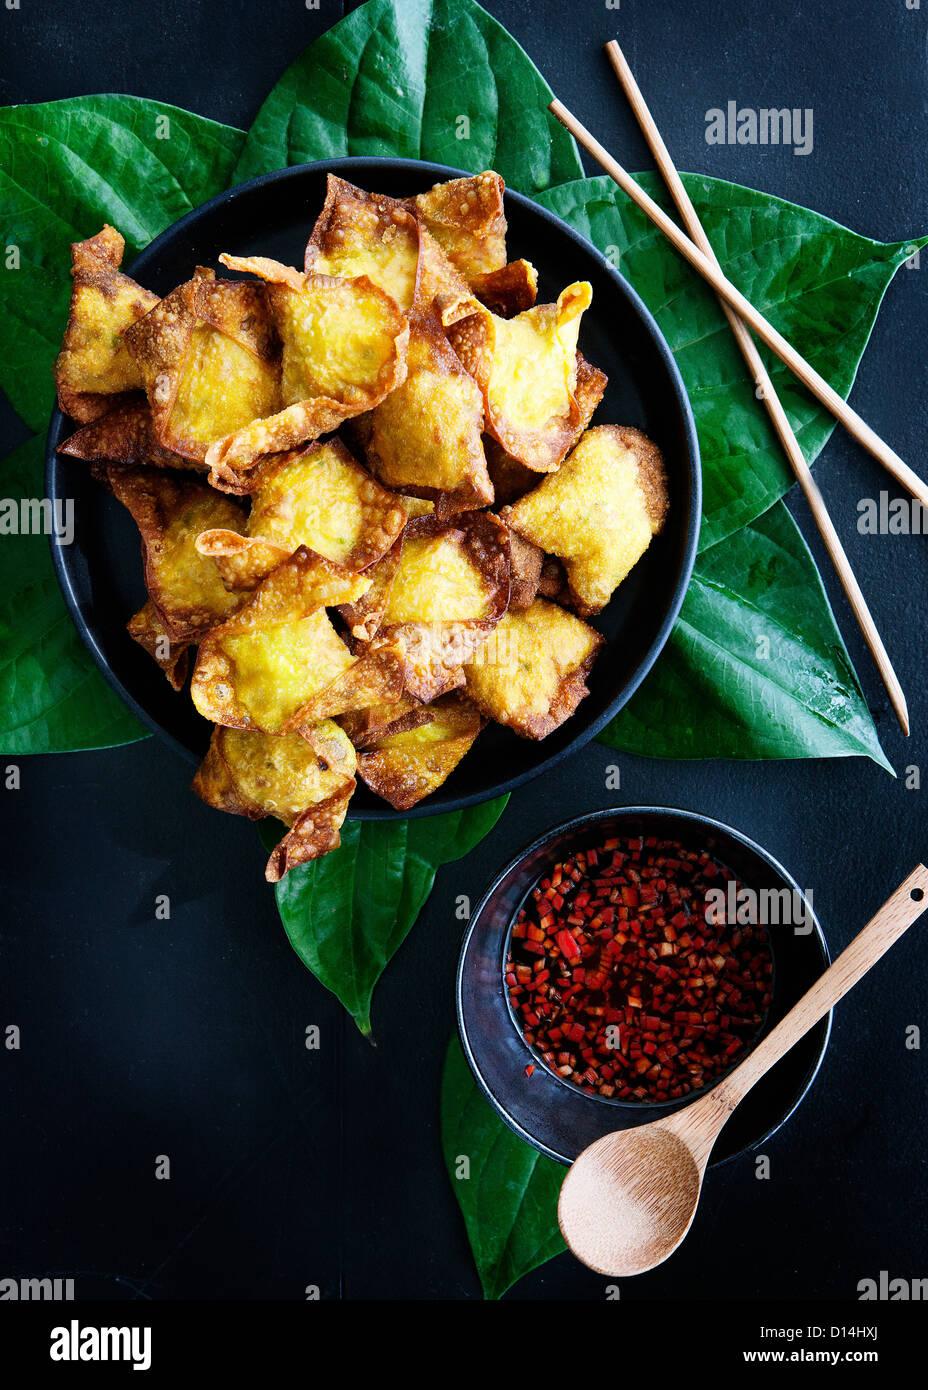 Plate of deep fried dumplings with sauce - Stock Image